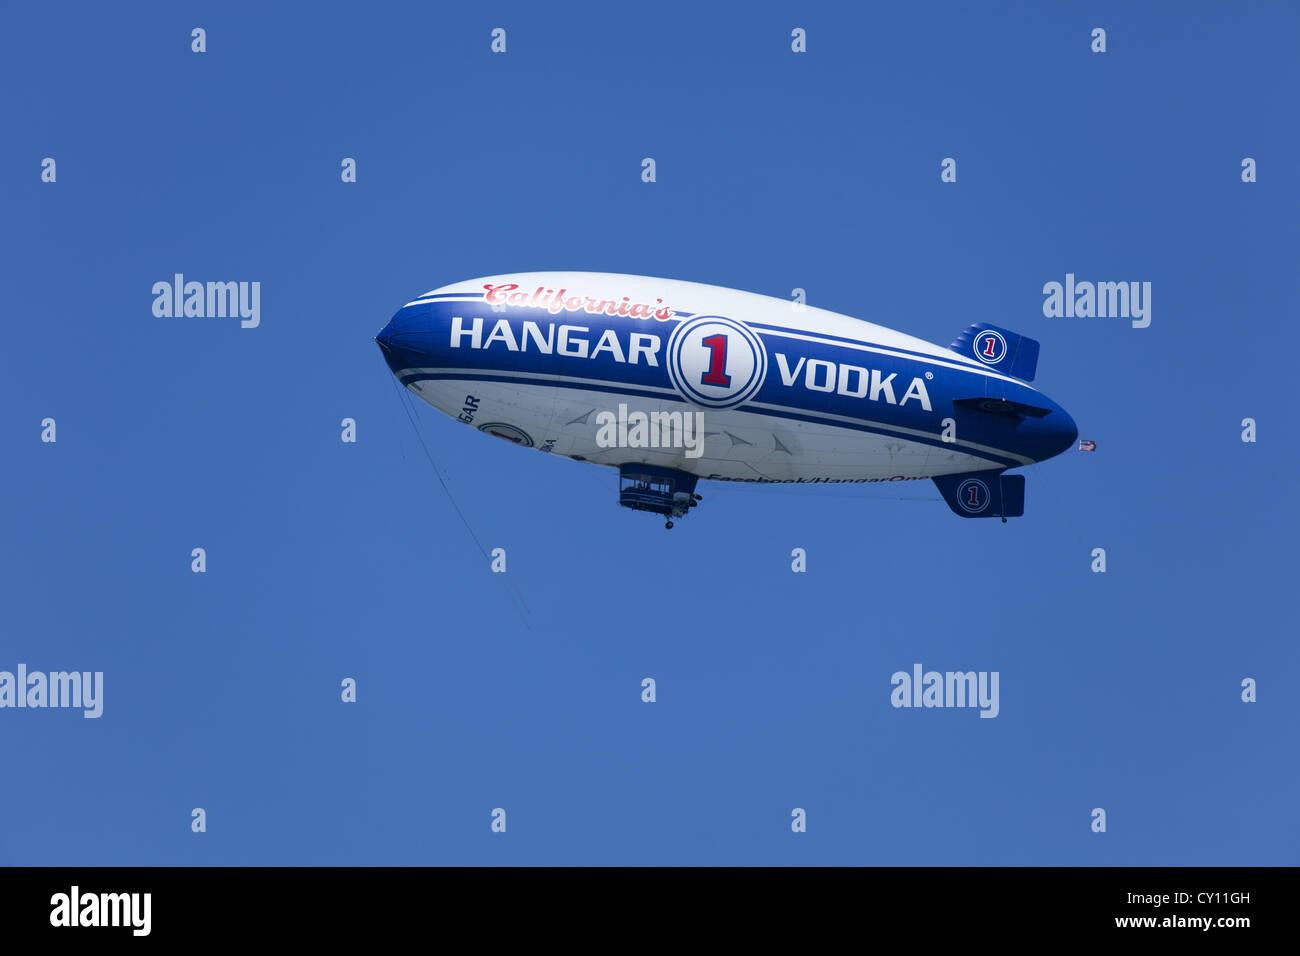 Hangar 1 Vodka blimp. A Spector 19, Model A-60+ airship - Stock Image